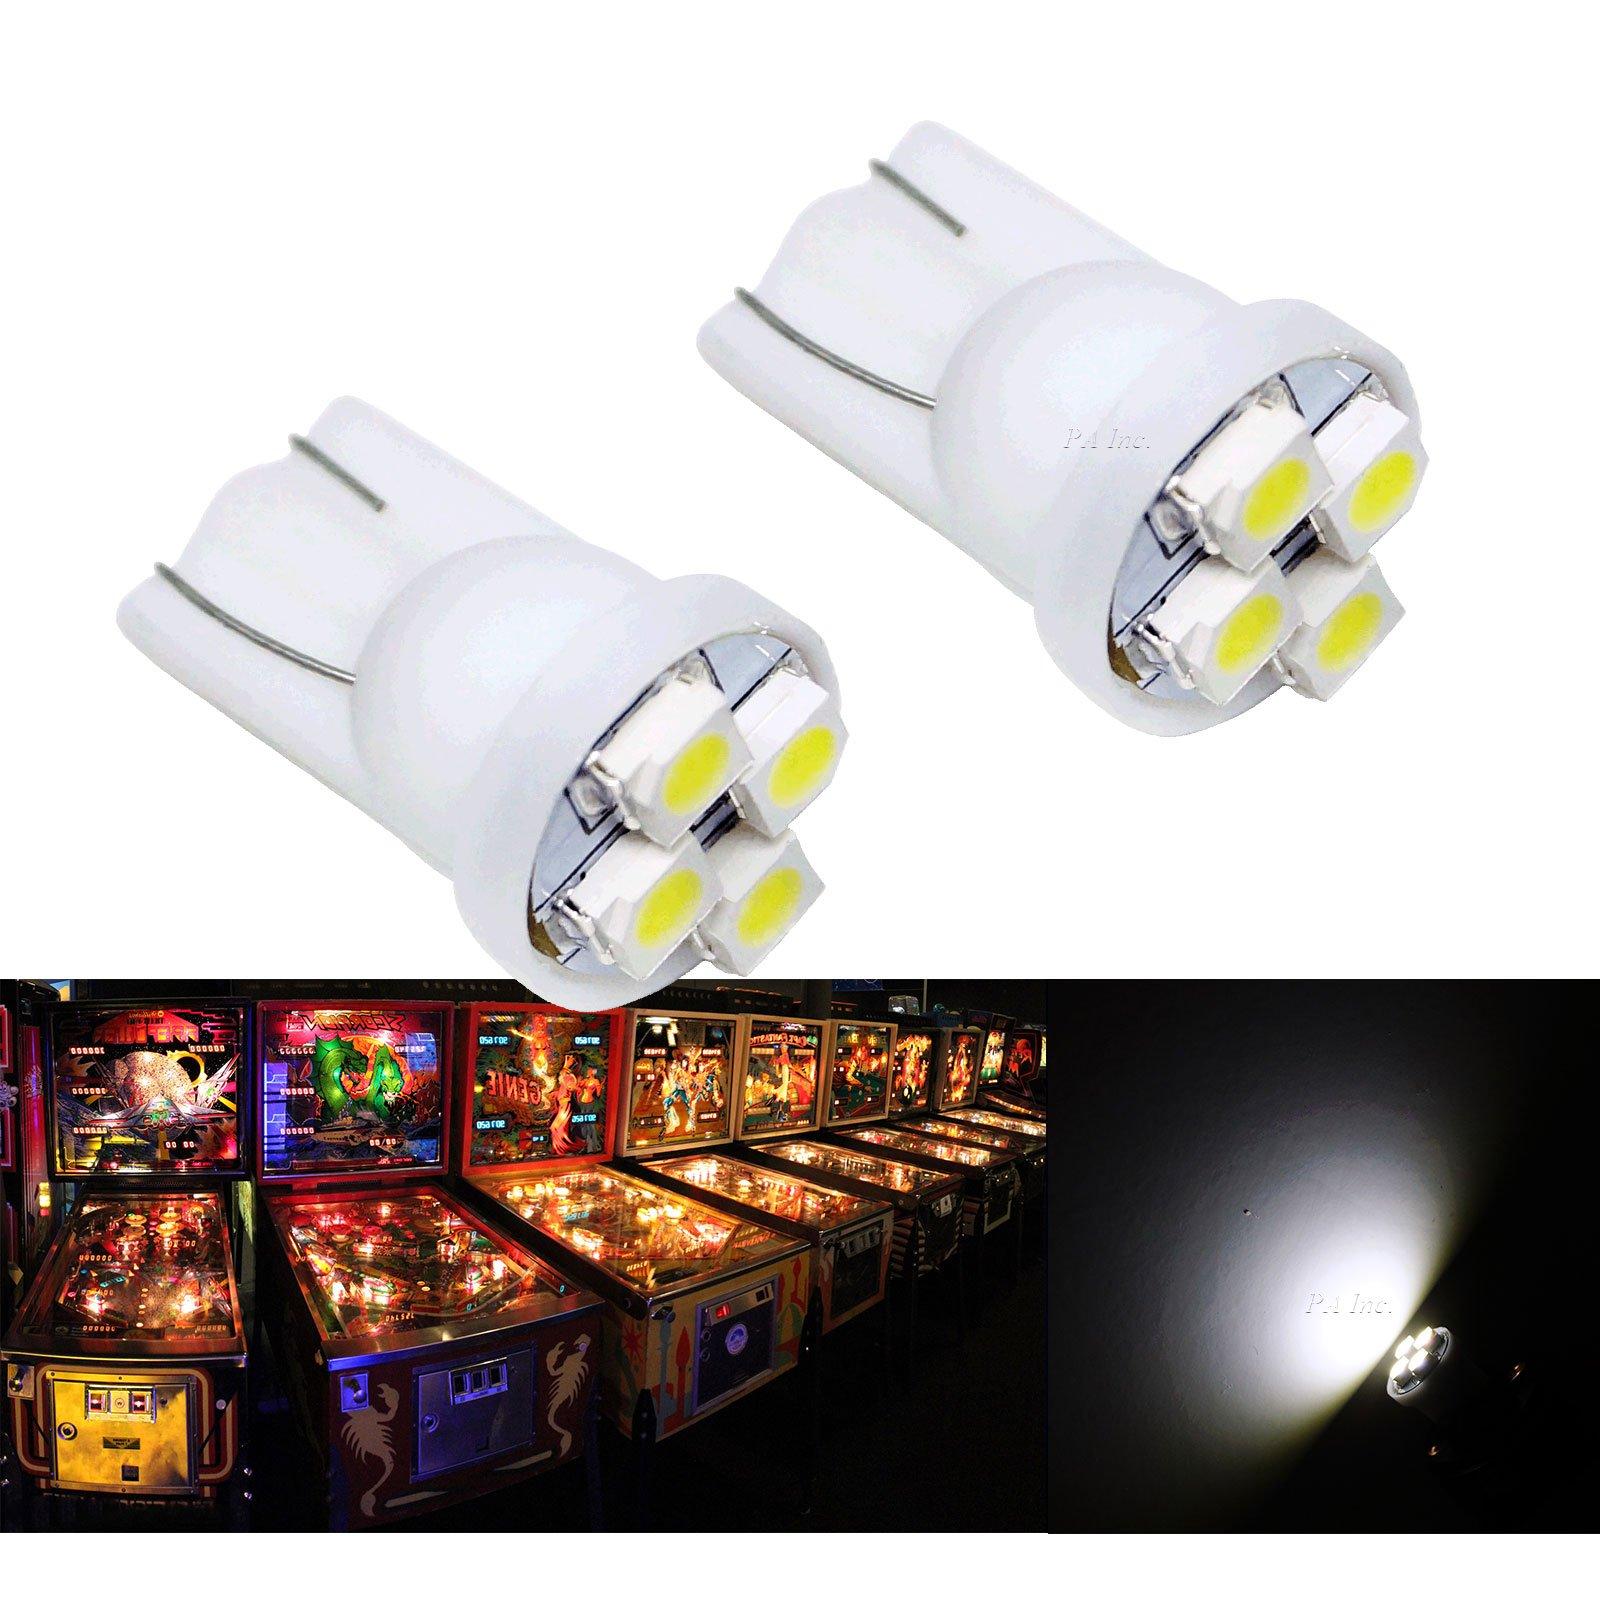 PA 25PCS #555 T10 4SMD LED Pinball Machine Light Bulb White-6.3V by PA